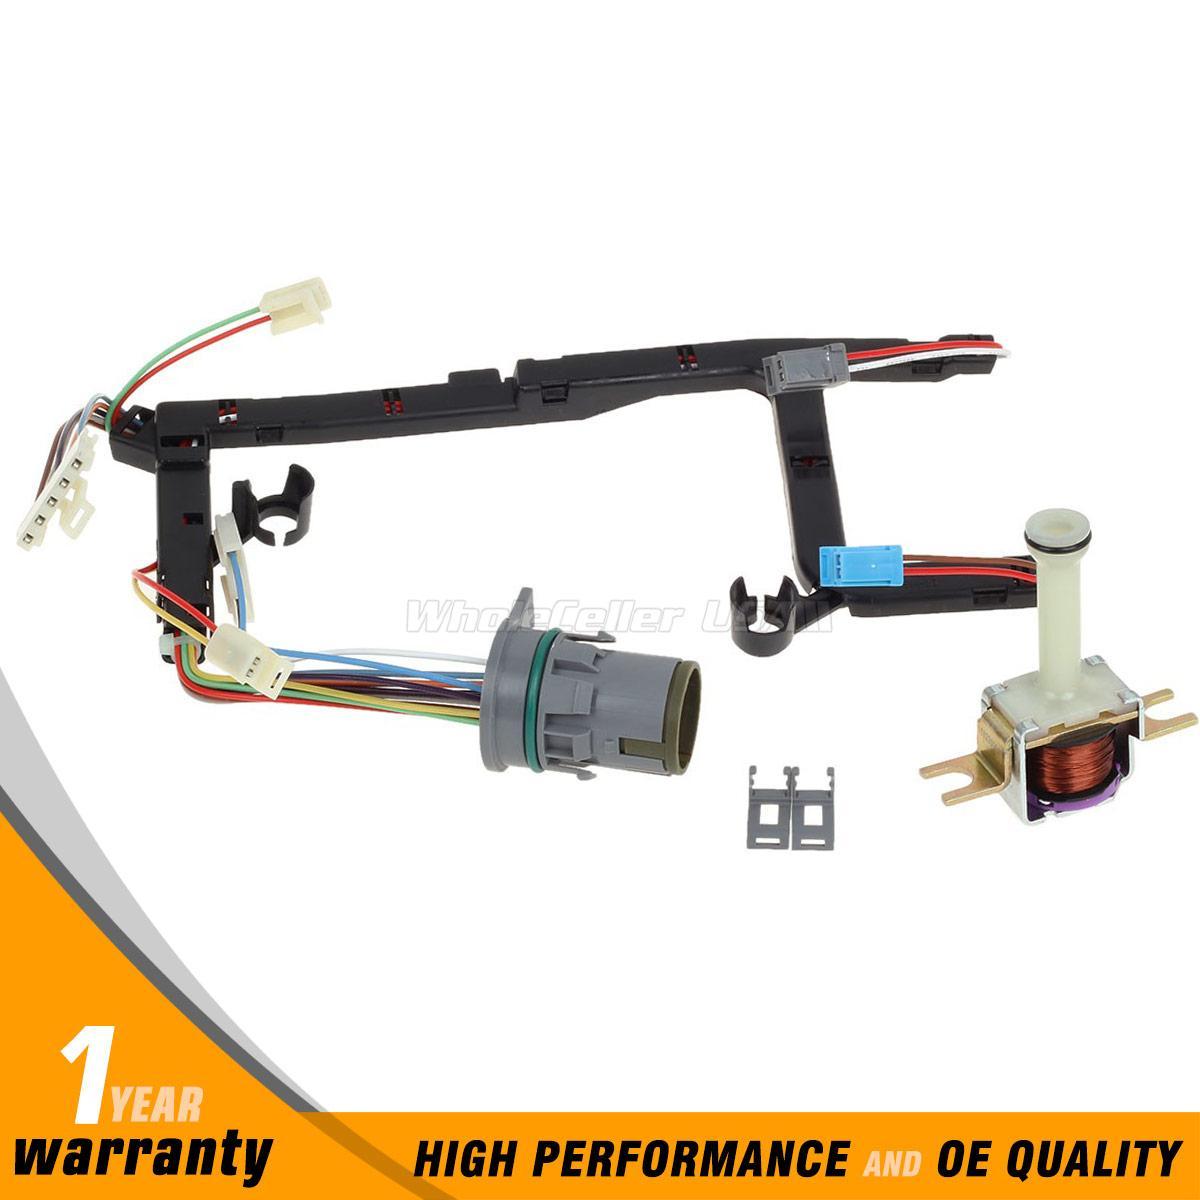 4l60e 4l65e internal wire harness w  tcc solenoid 1993 2002 GMC Envoy Problems 2002 GMC Envoy Specs